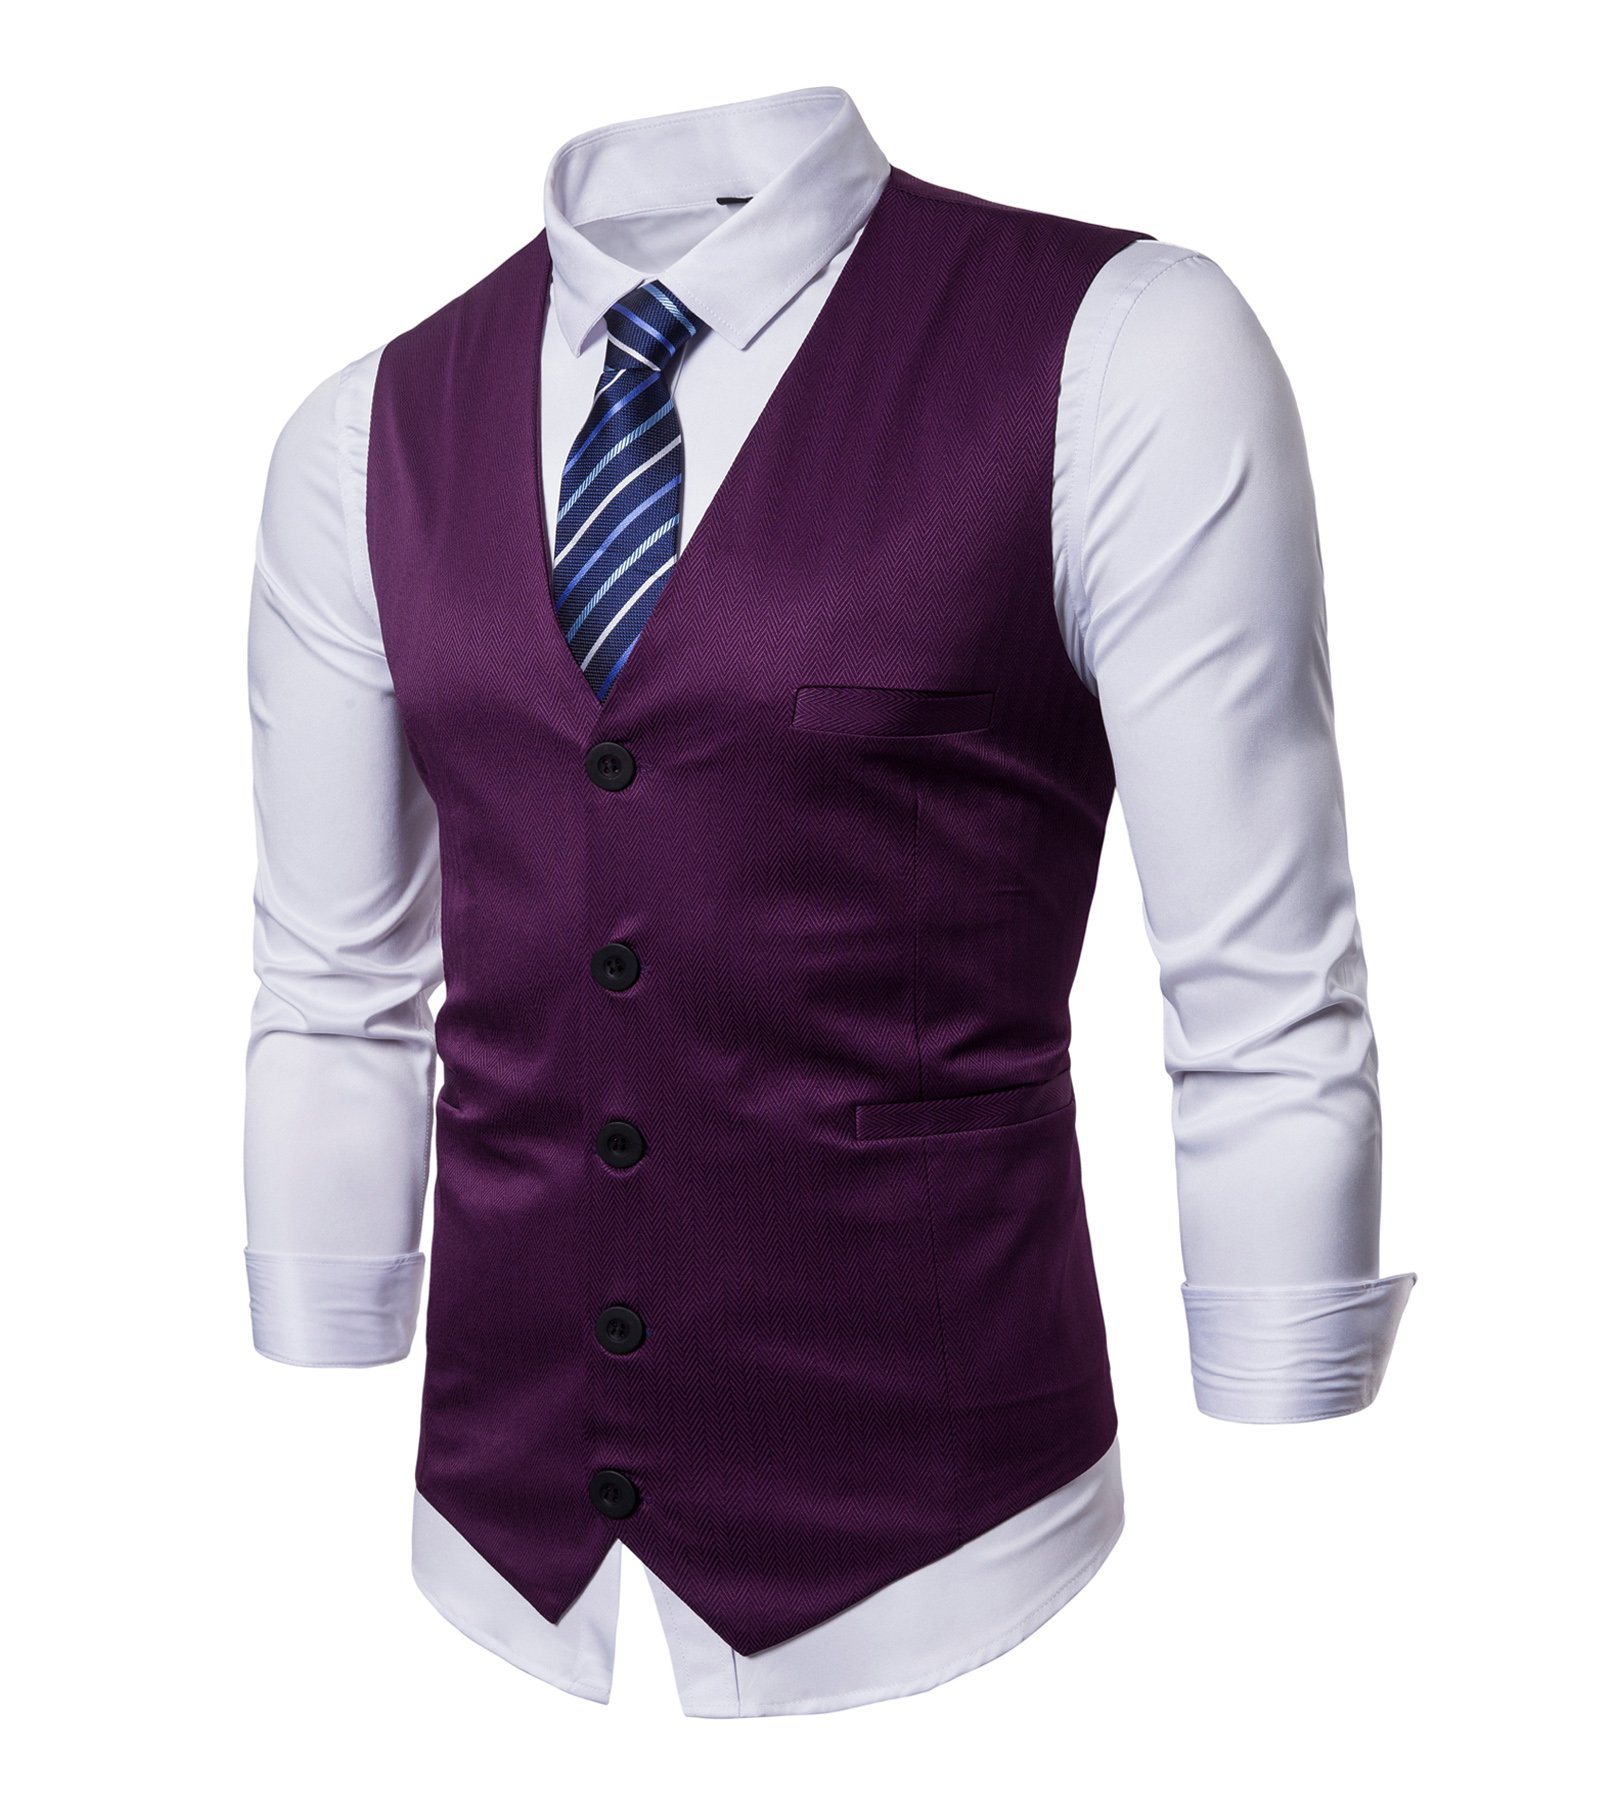 Winoto Business Suit Vest Mens Slim Fit Waistcoat with Blue Striped Necktie